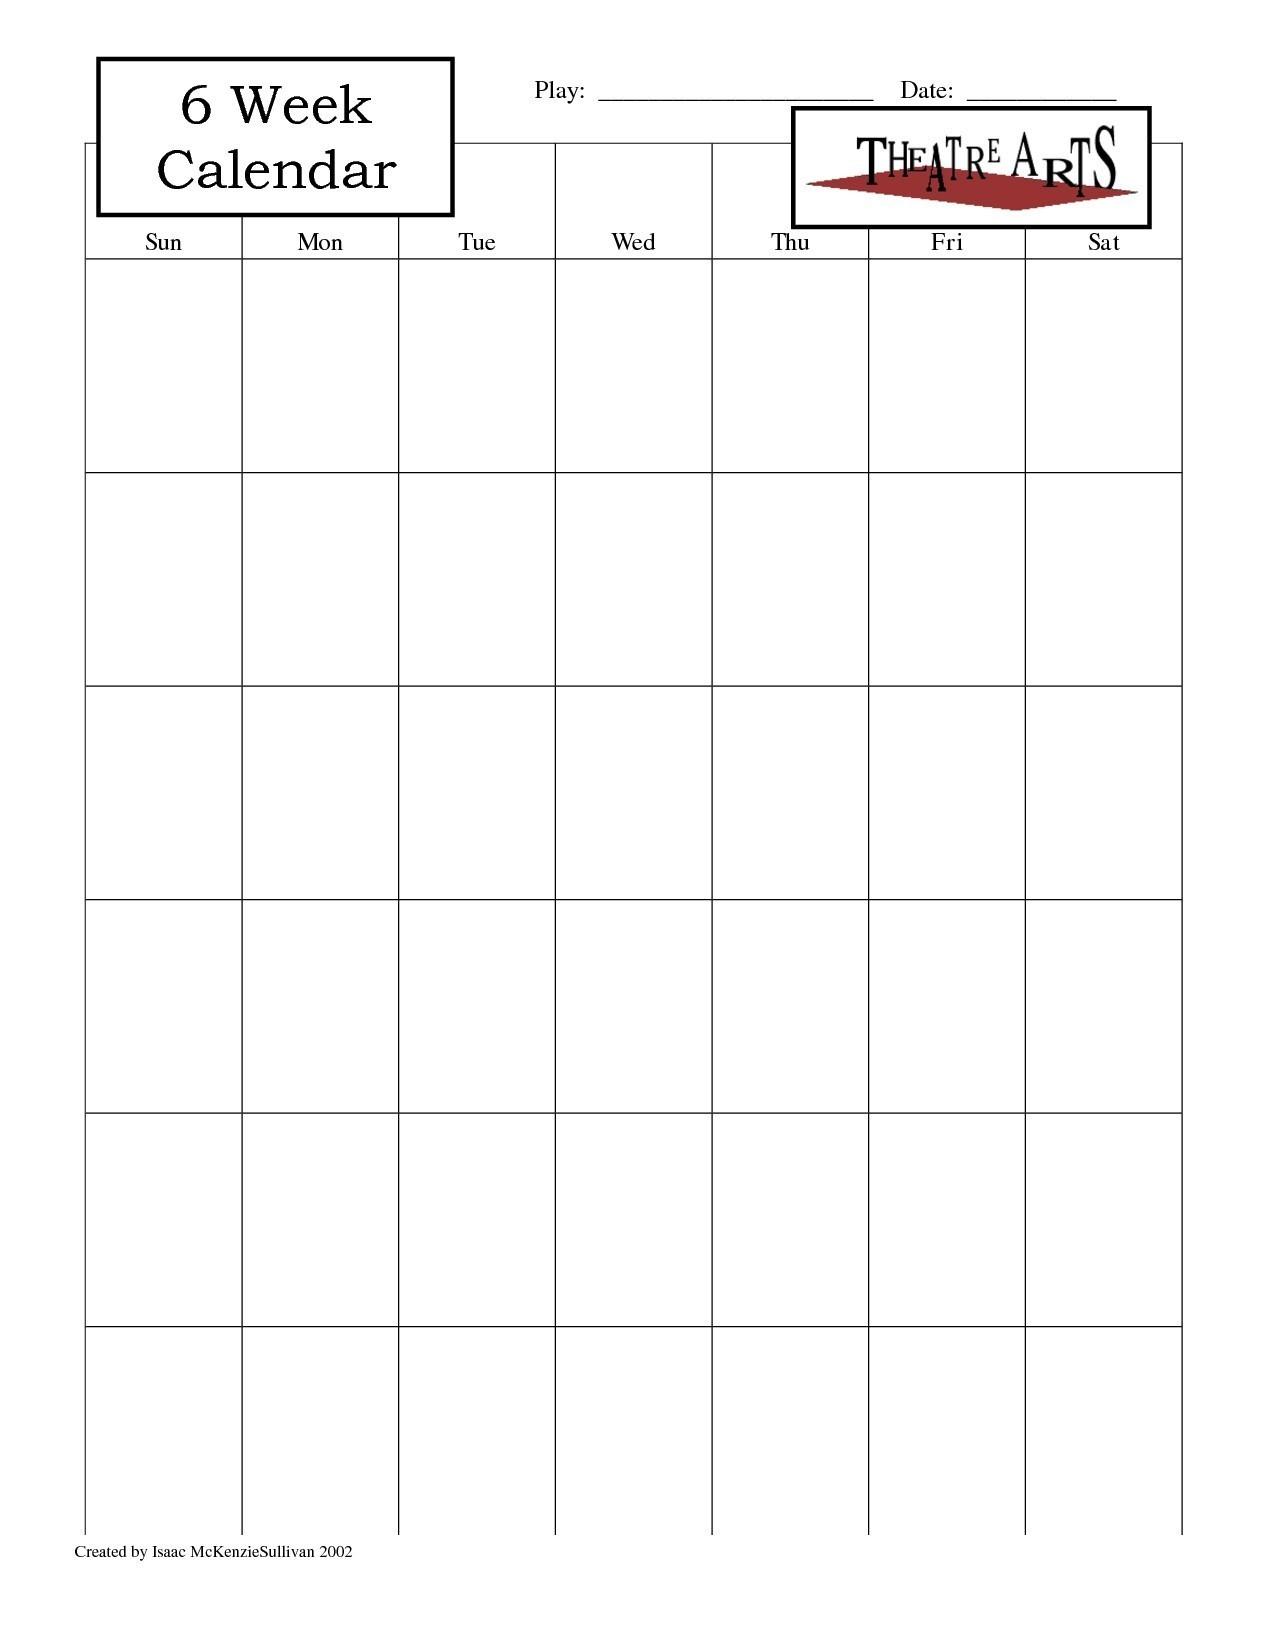 Blank 6 Week Calendar  </p>   </div>        <br>     <div class=